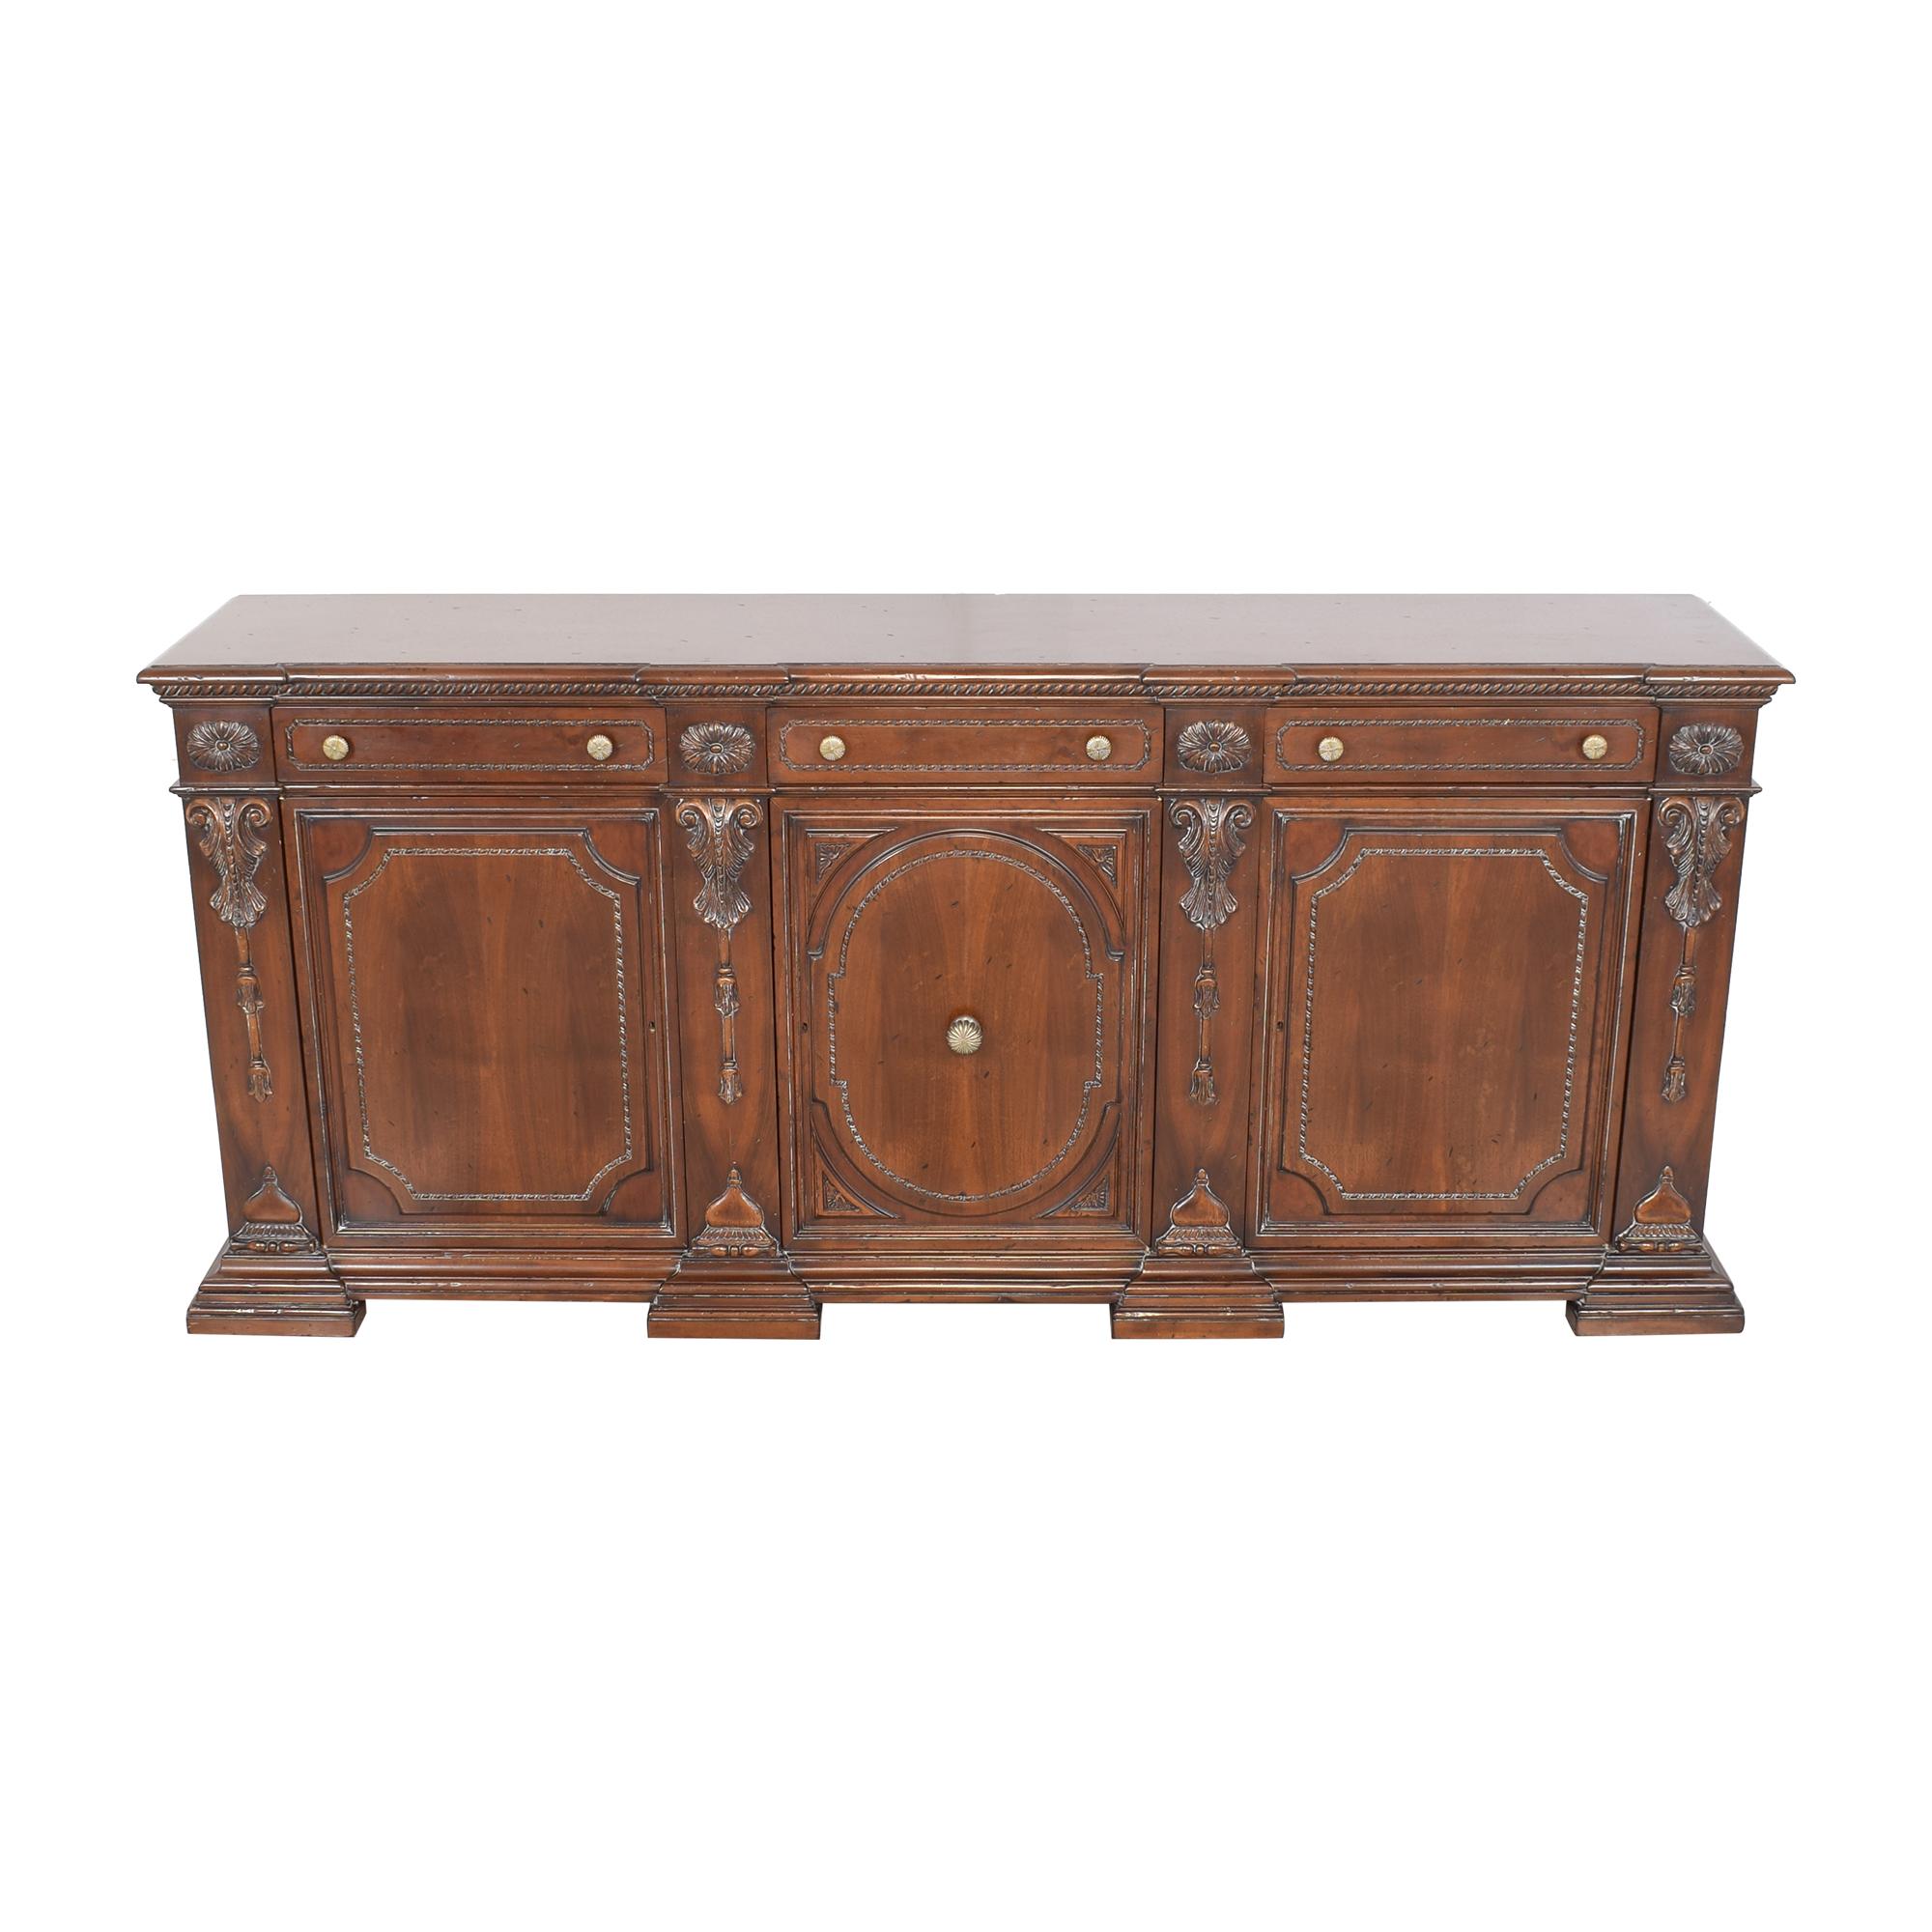 Francesco Molon XVI Century Carved Sideboard / Cabinets & Sideboards